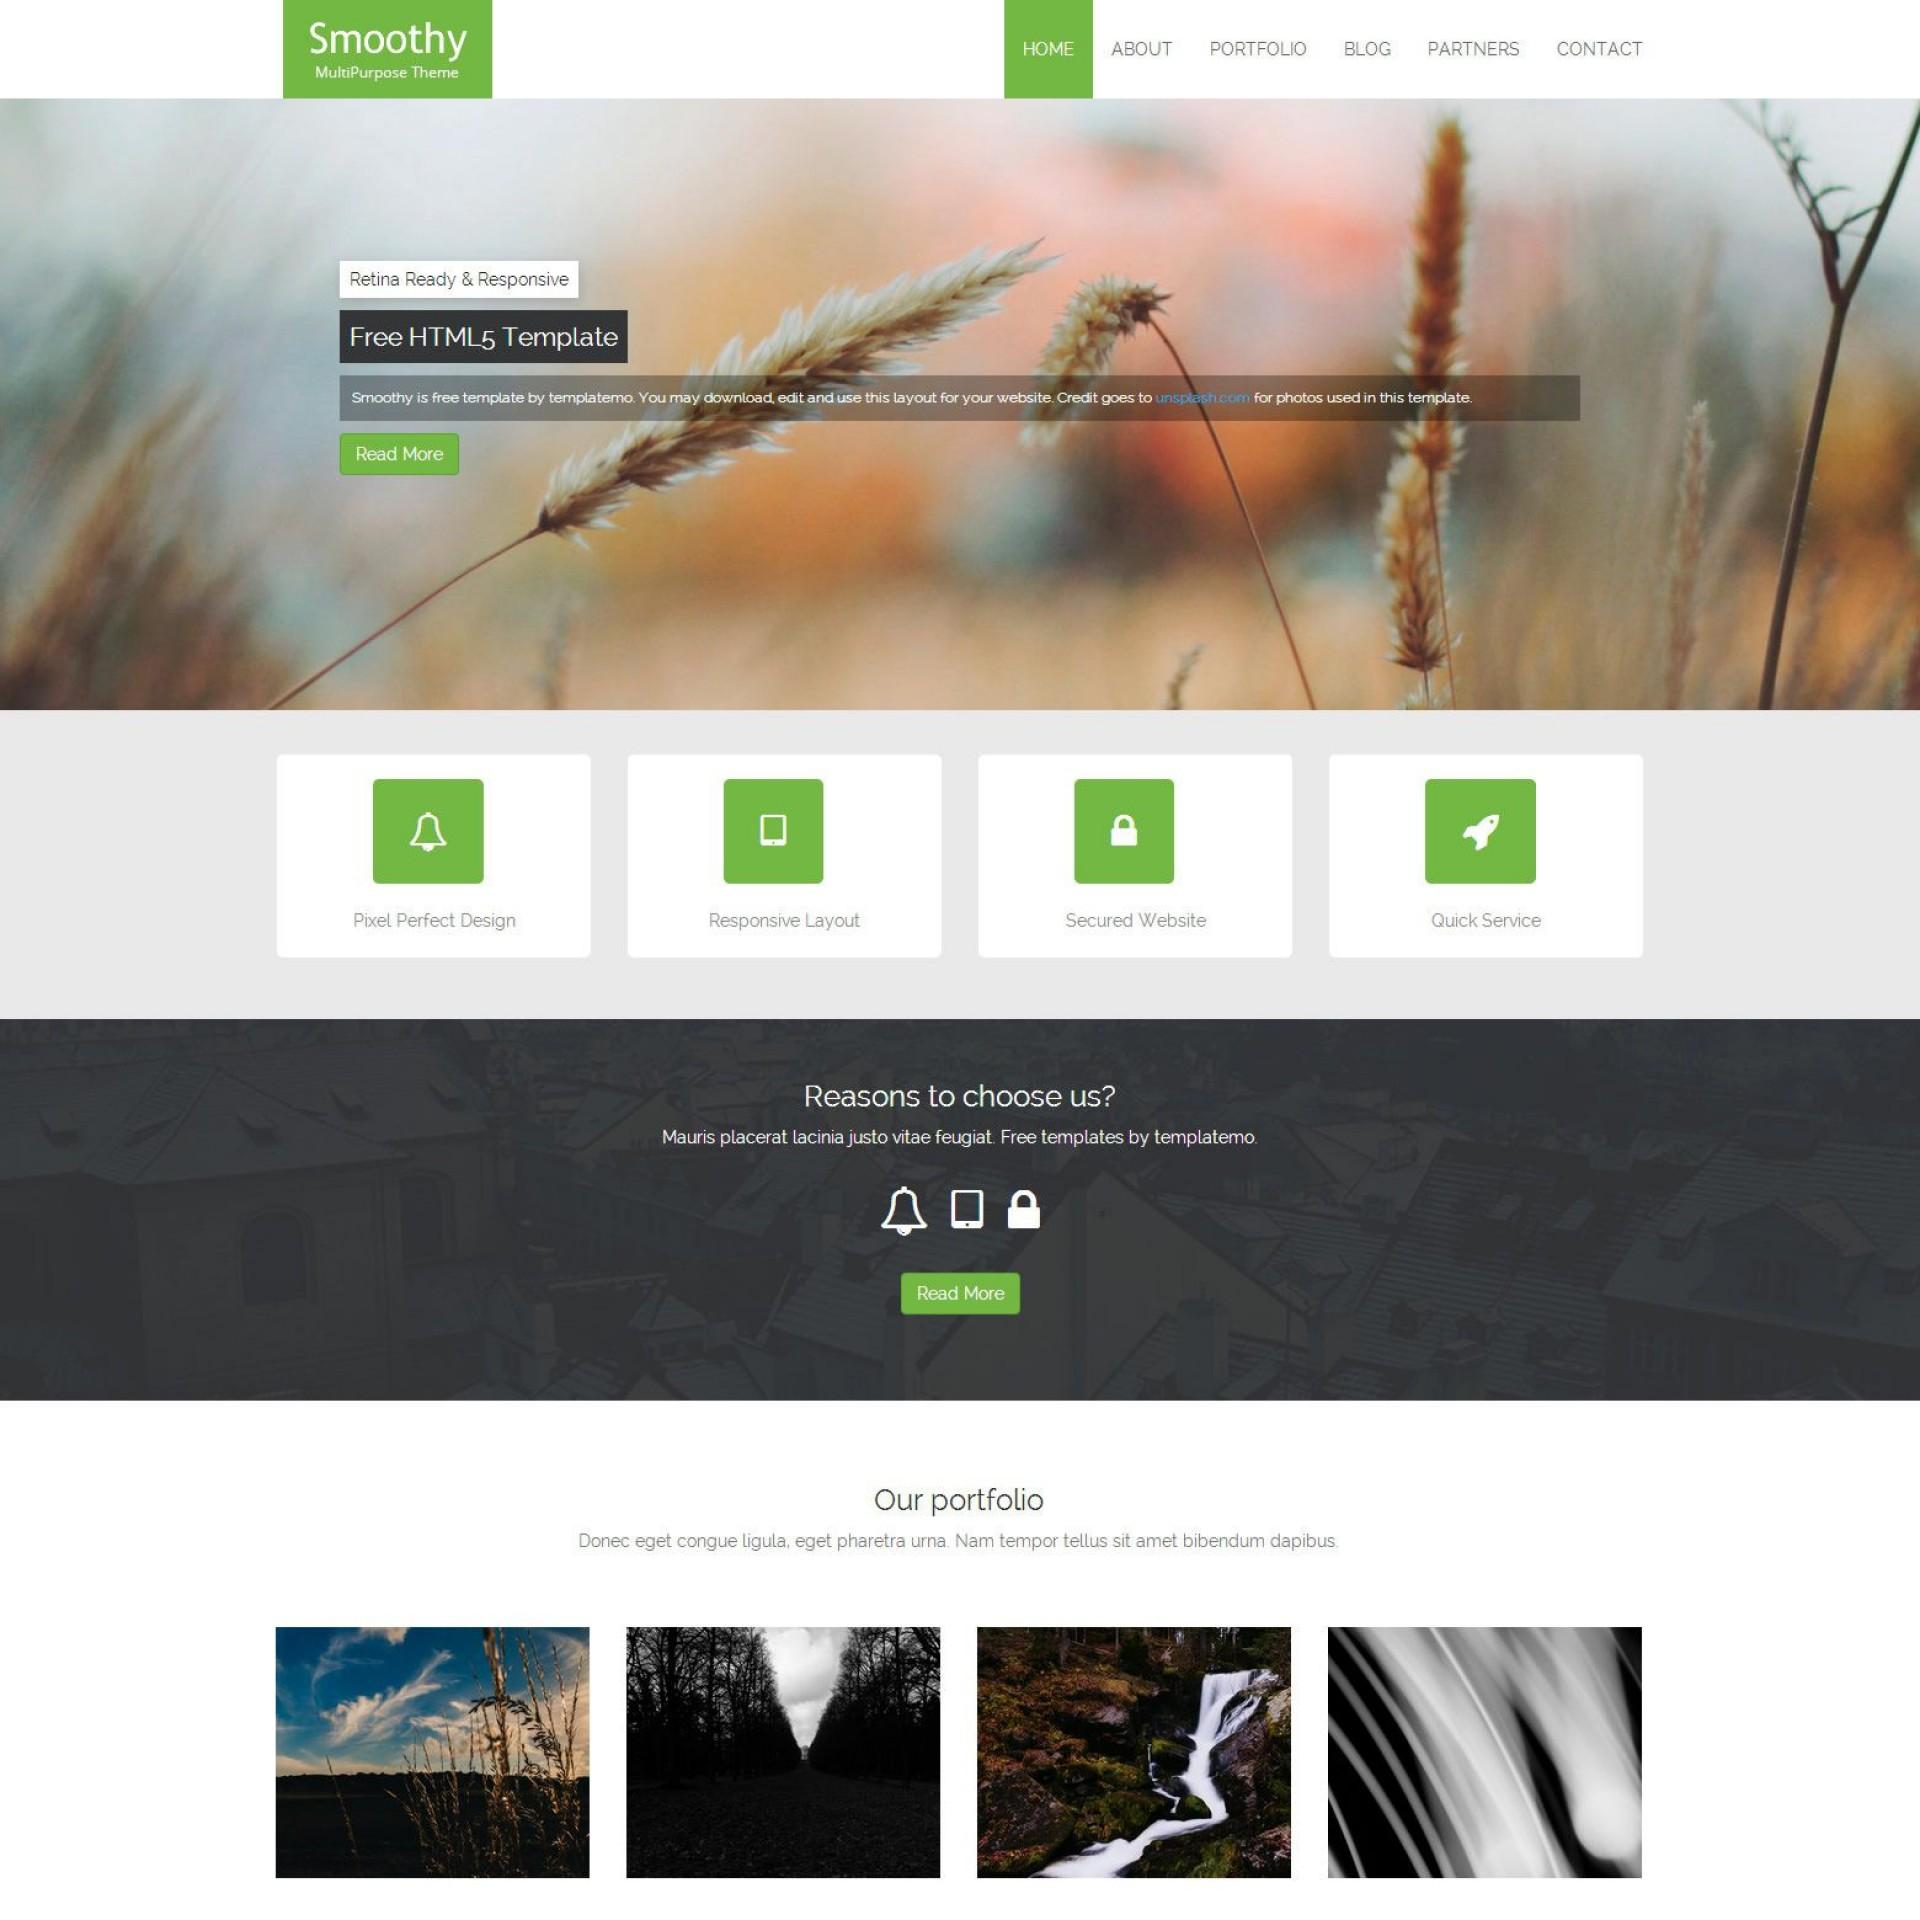 008 Best Dream Weaver Web Template Inspiration  Templates1920